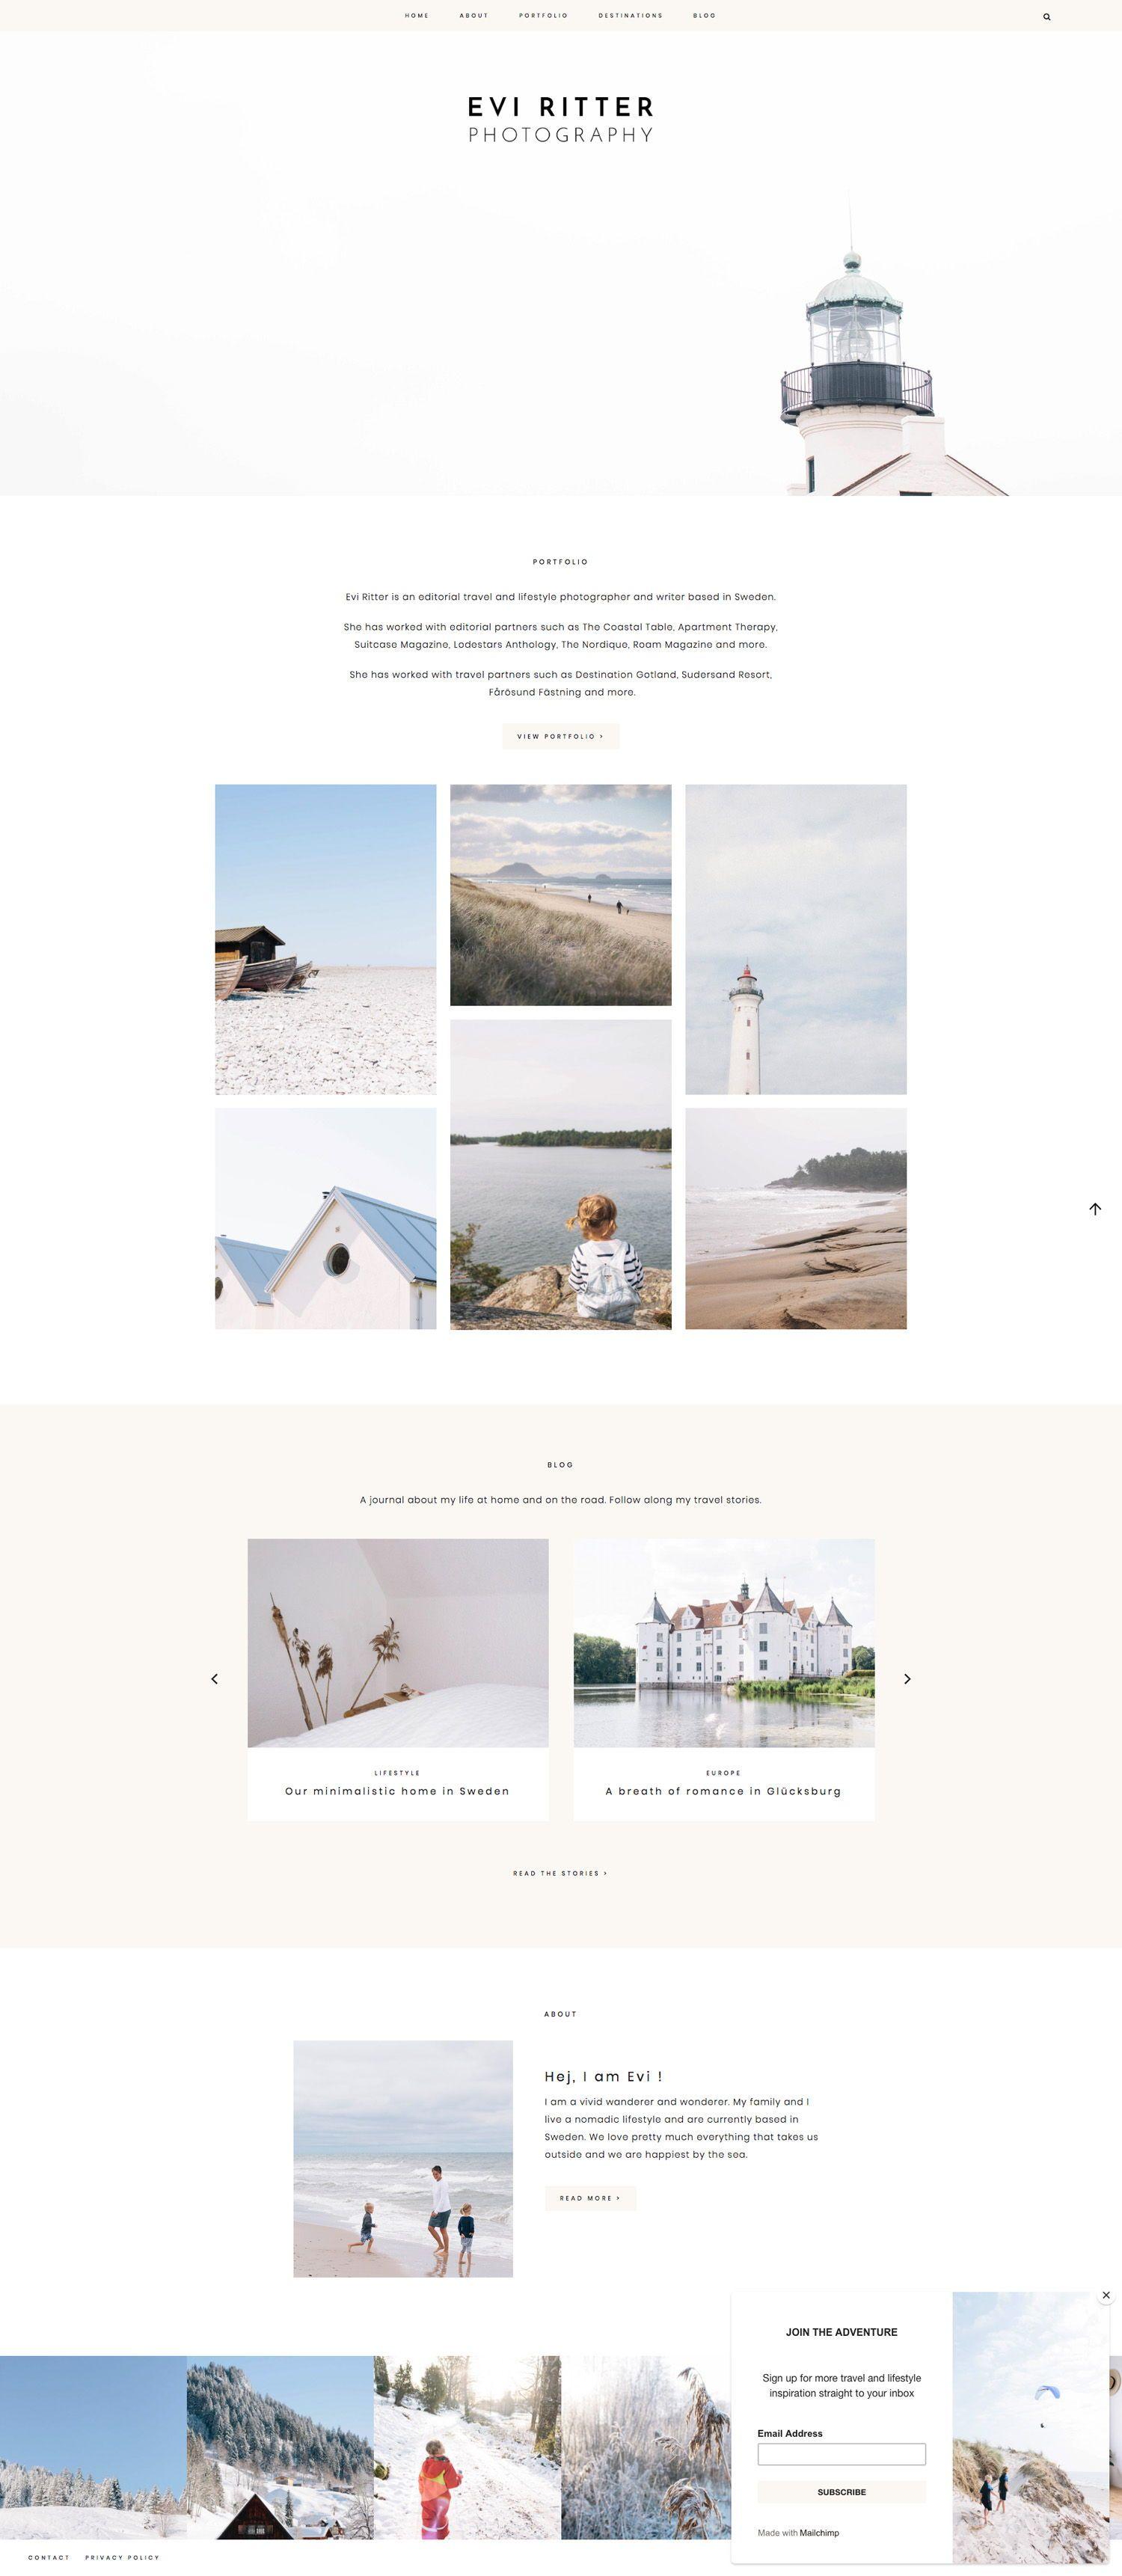 Pin By Tina Drejer Bay On Branding In 2020 Portfolio Website Design Wordpress Website Design Wordpress Design